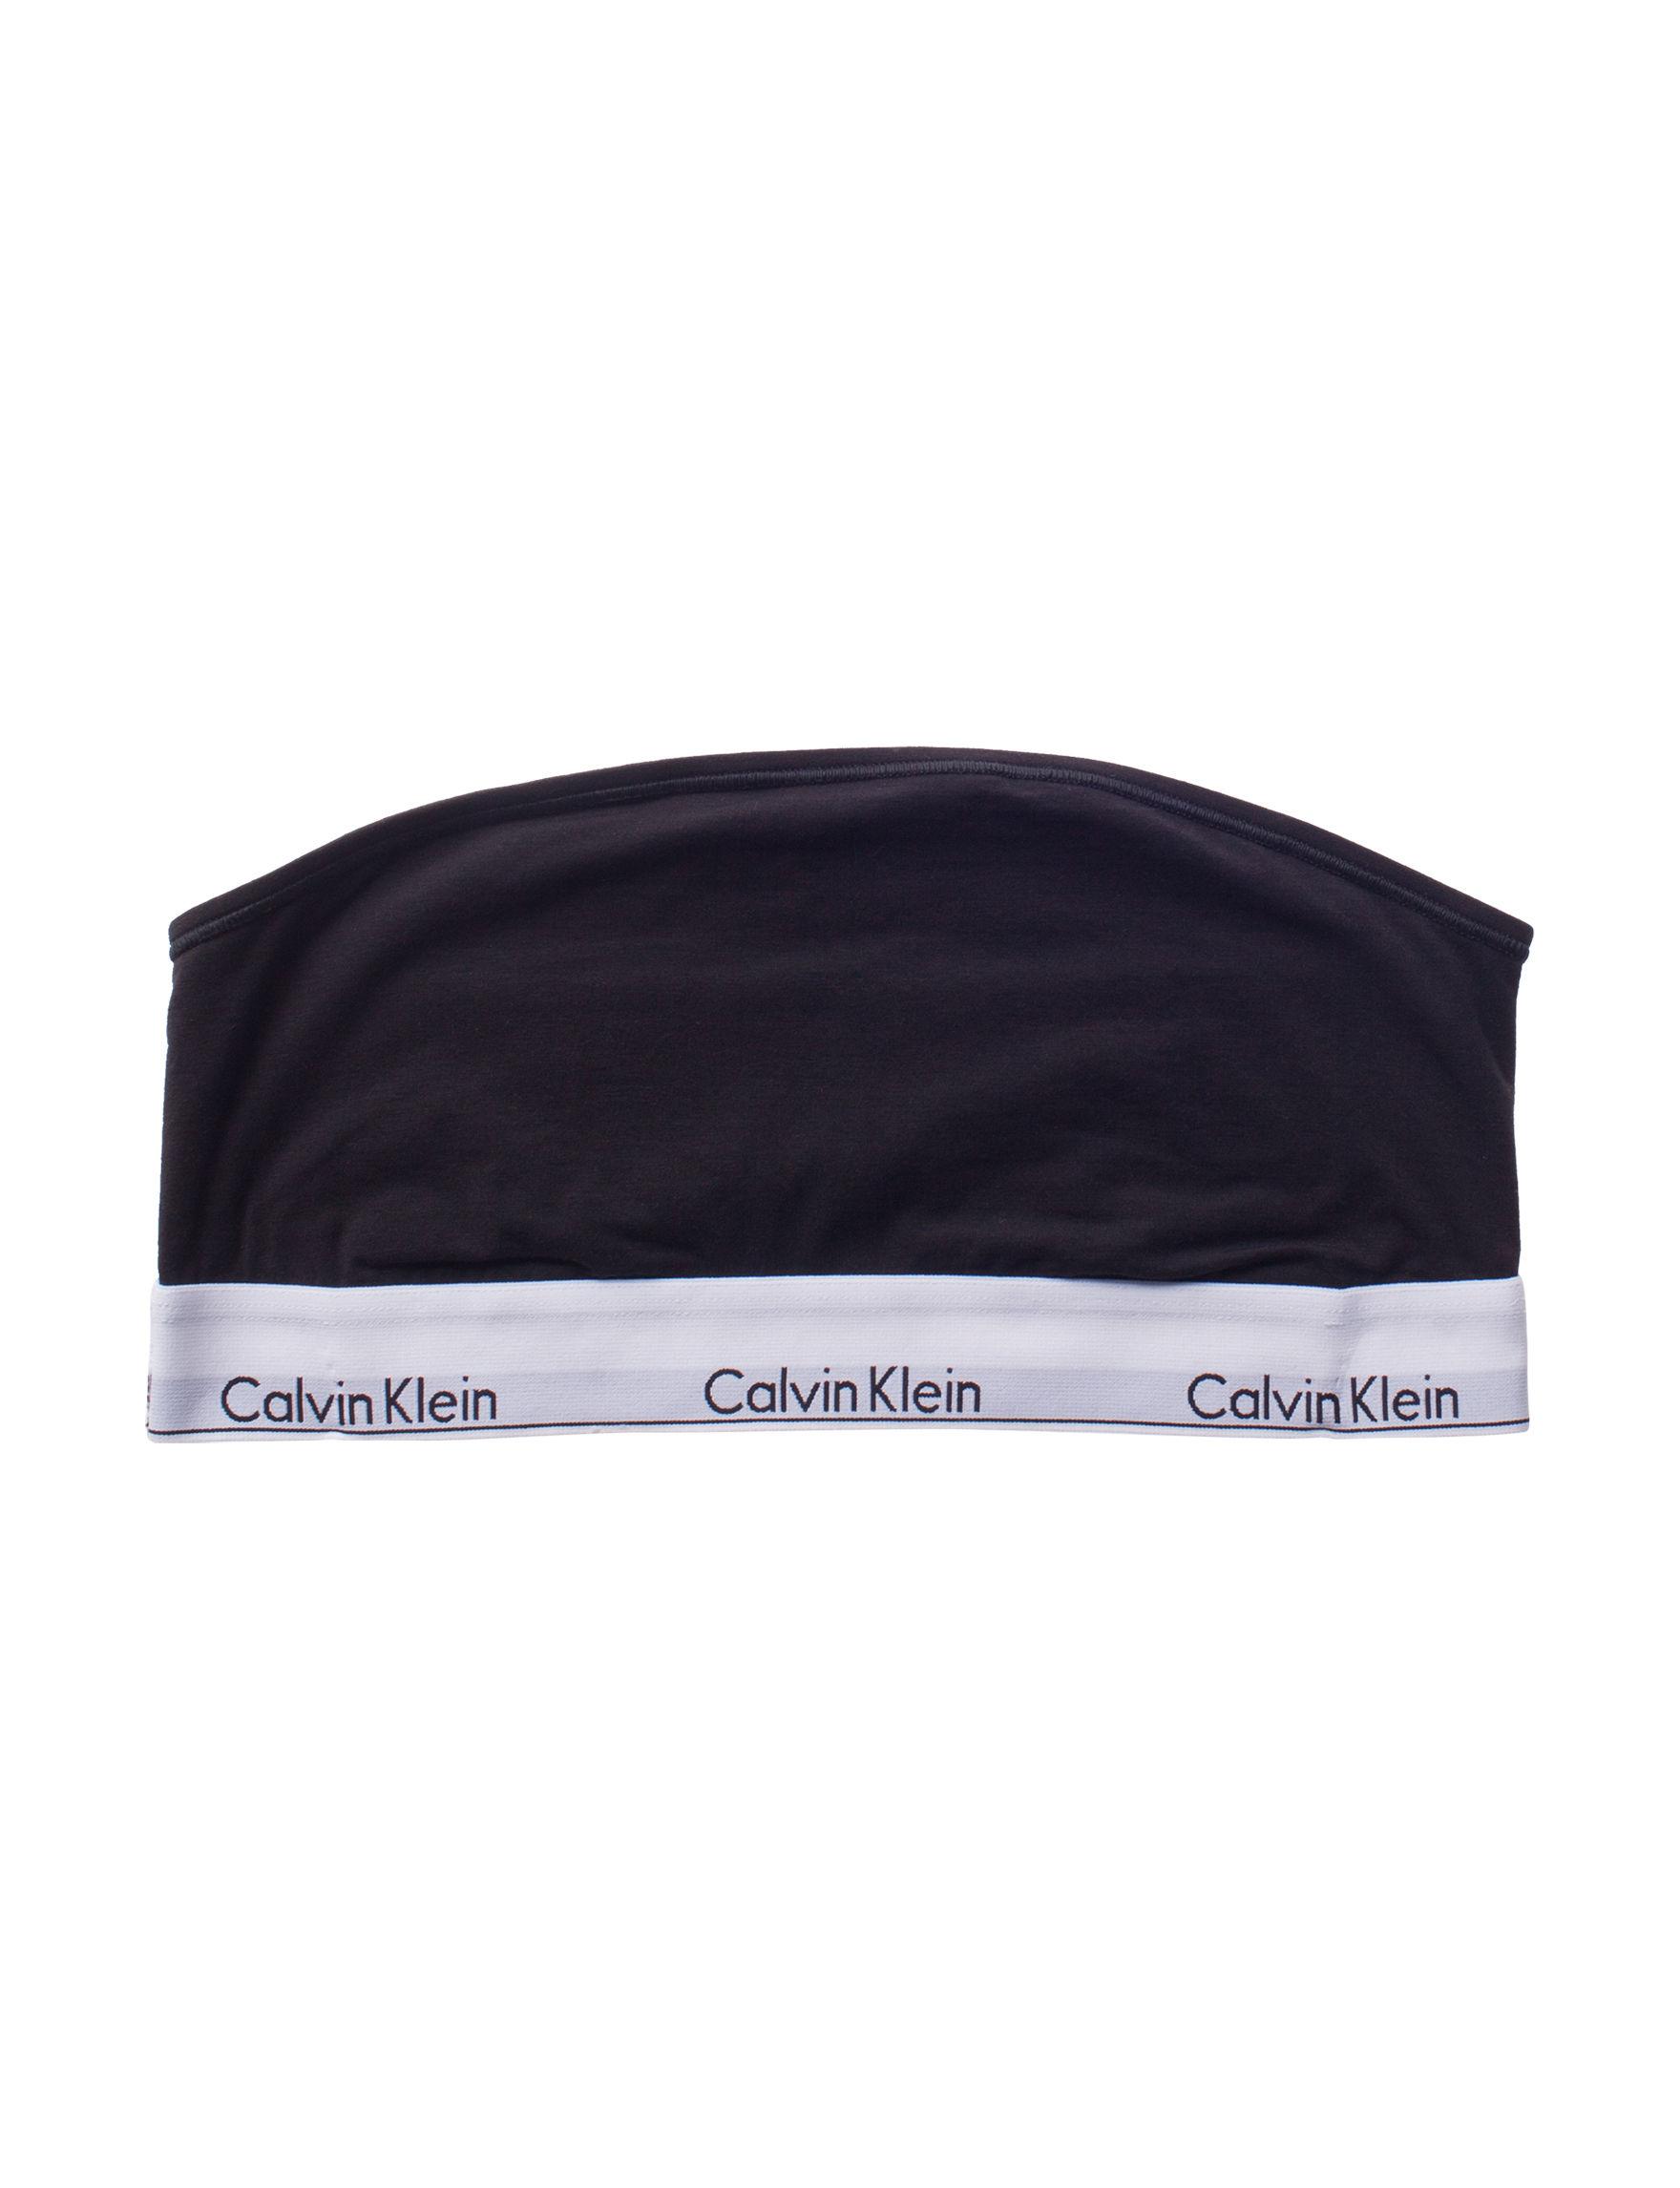 Calvin Klein Black Bras Bandeau Unlined